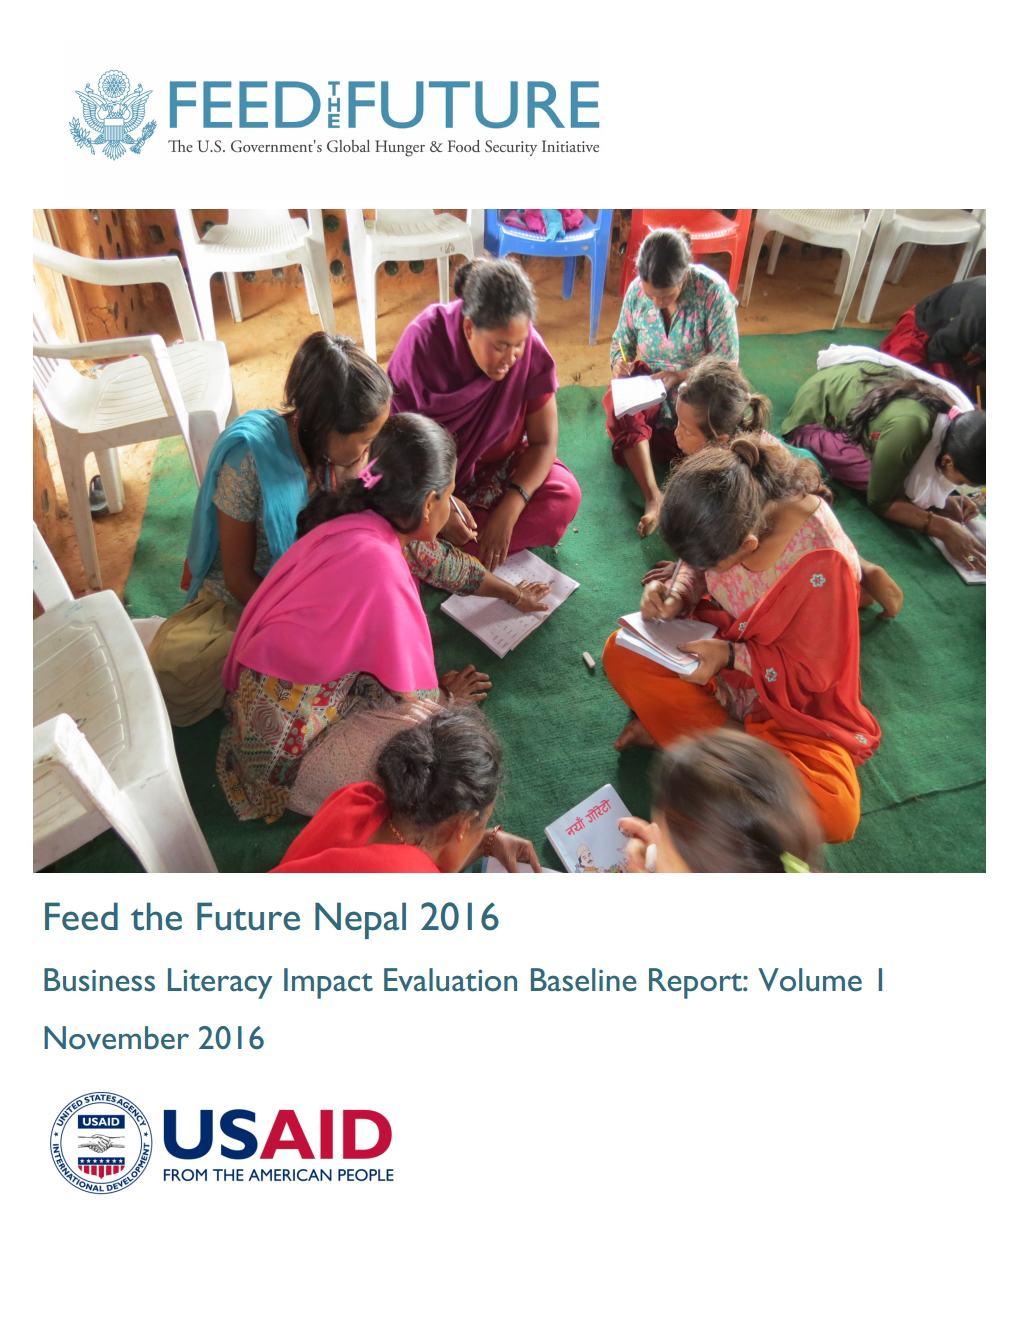 Feed the Future Nepal 2016: Business Literacy Impact Evaluation Baseline Survey